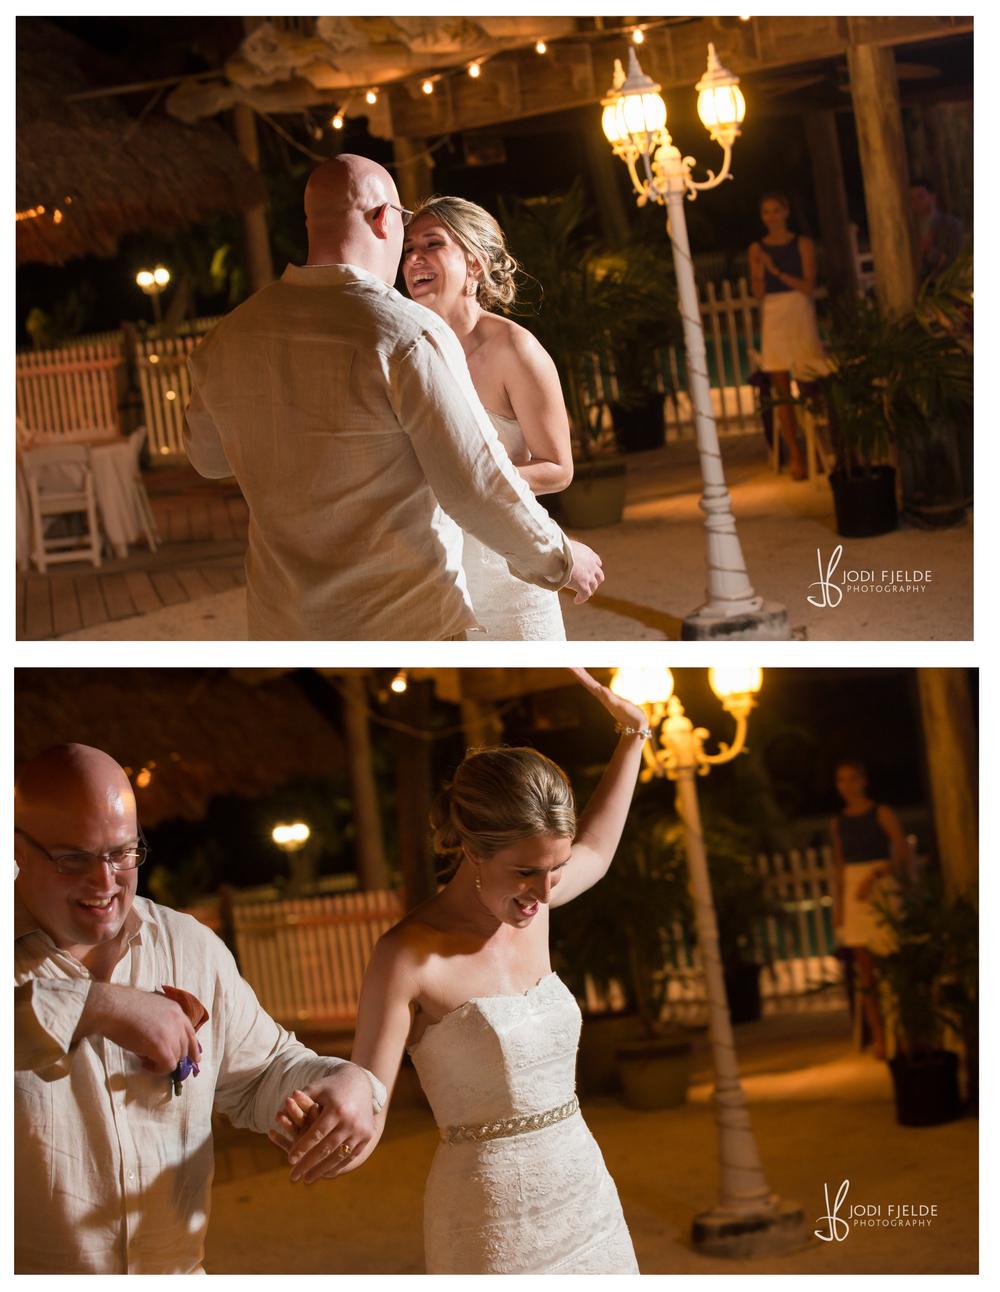 Cocconut_Cove_&_ Marina_ wedding_Kayla_and_Patrick 31.jpg